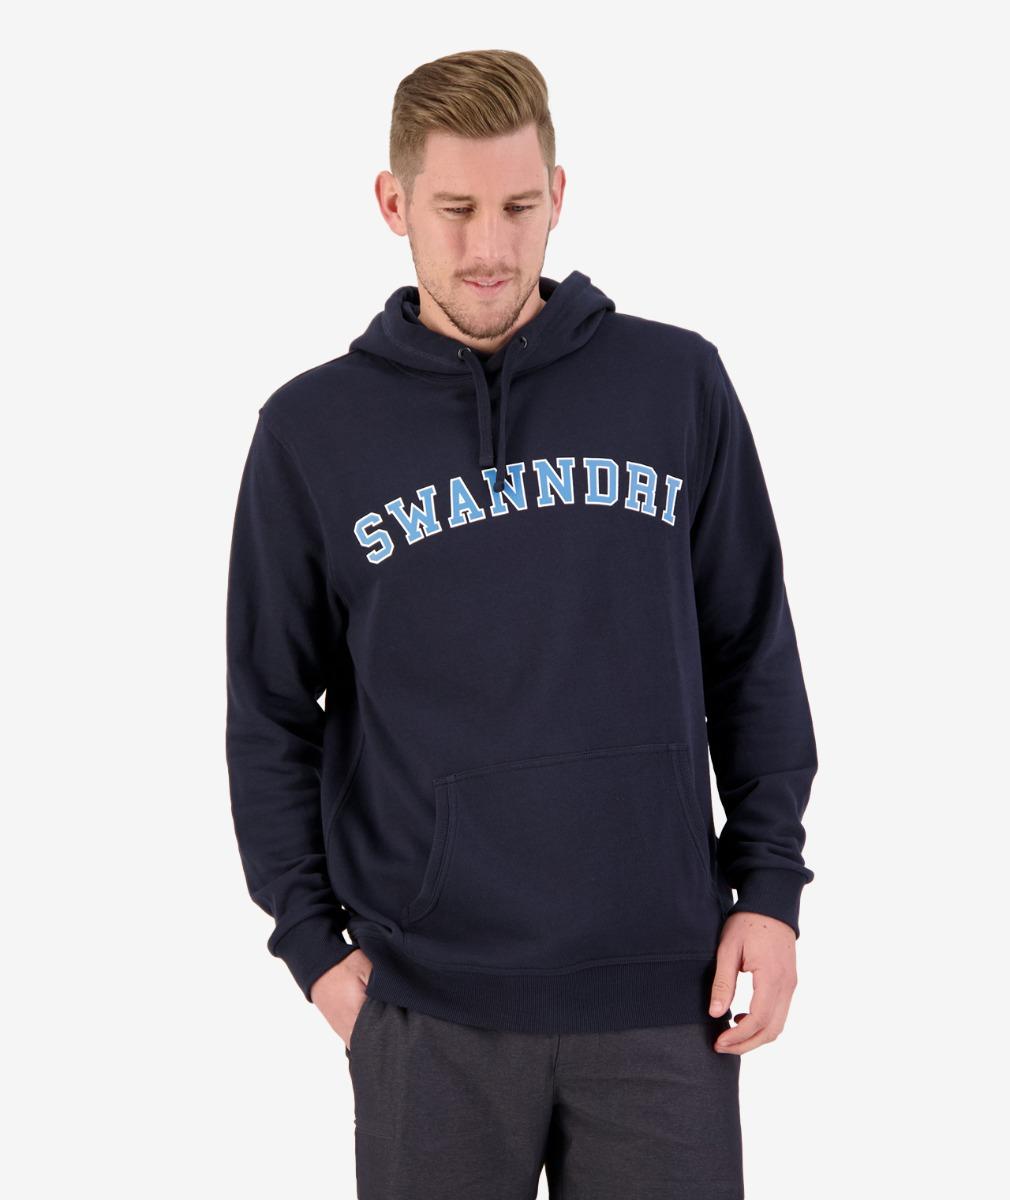 Swanndri Men's Collegiate Hoody